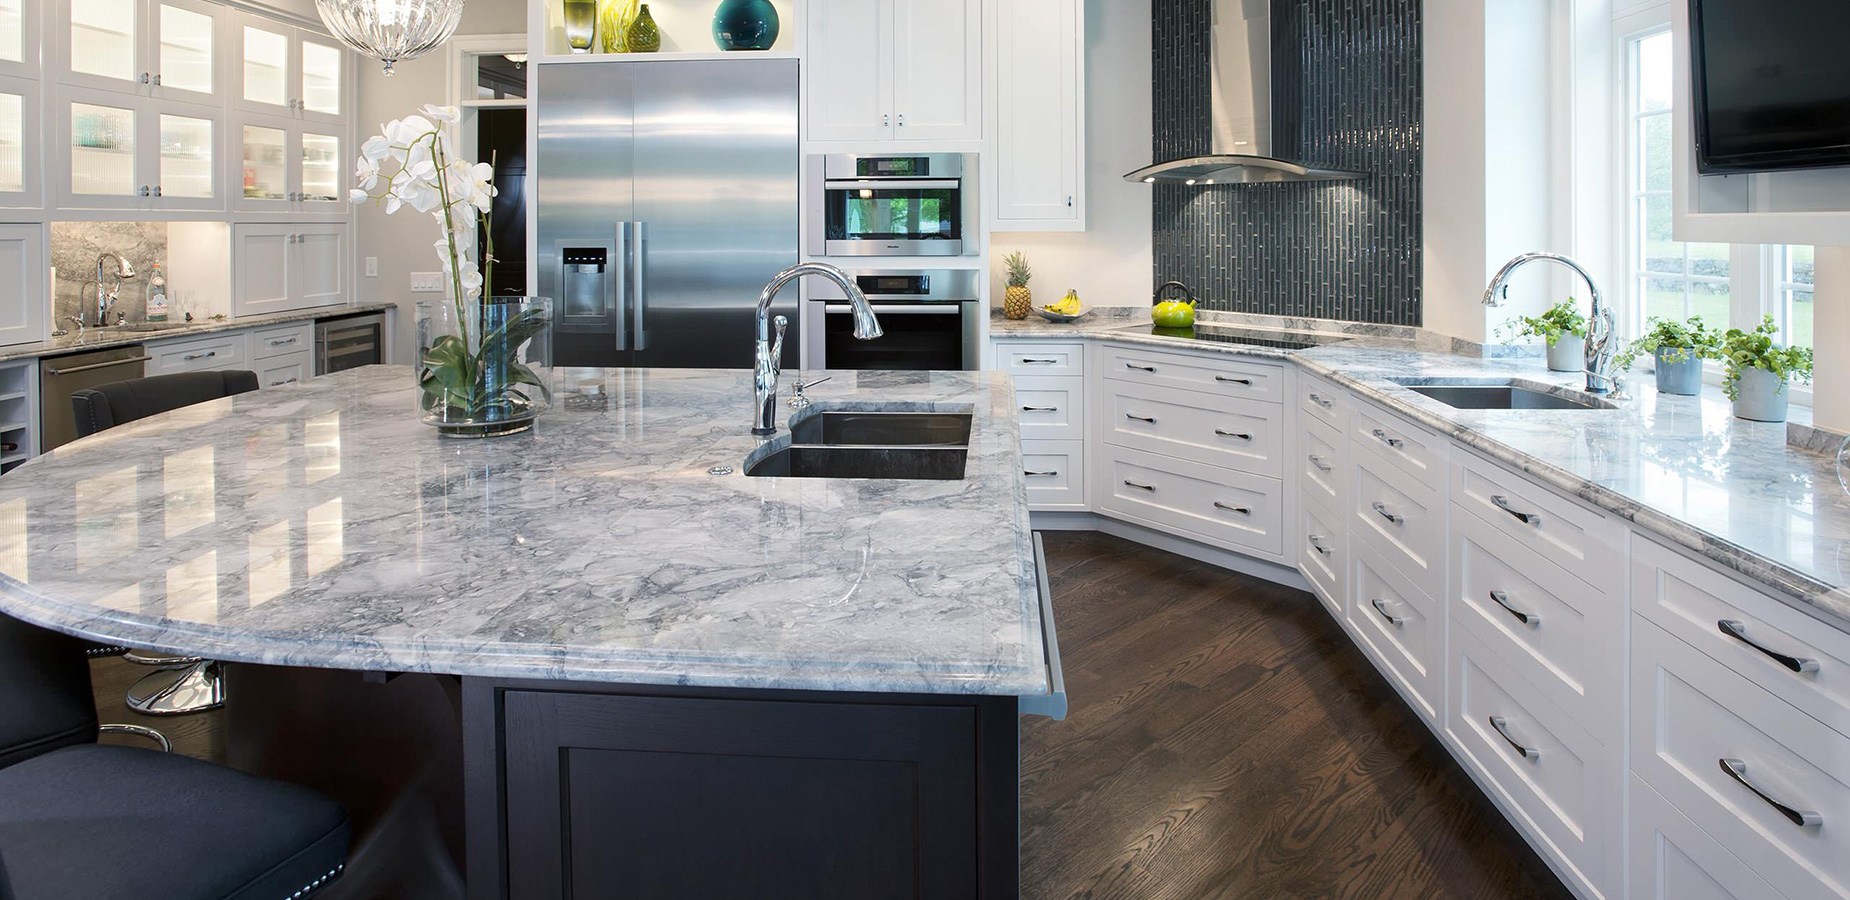 Stoneworks Marble and Granite LTD.